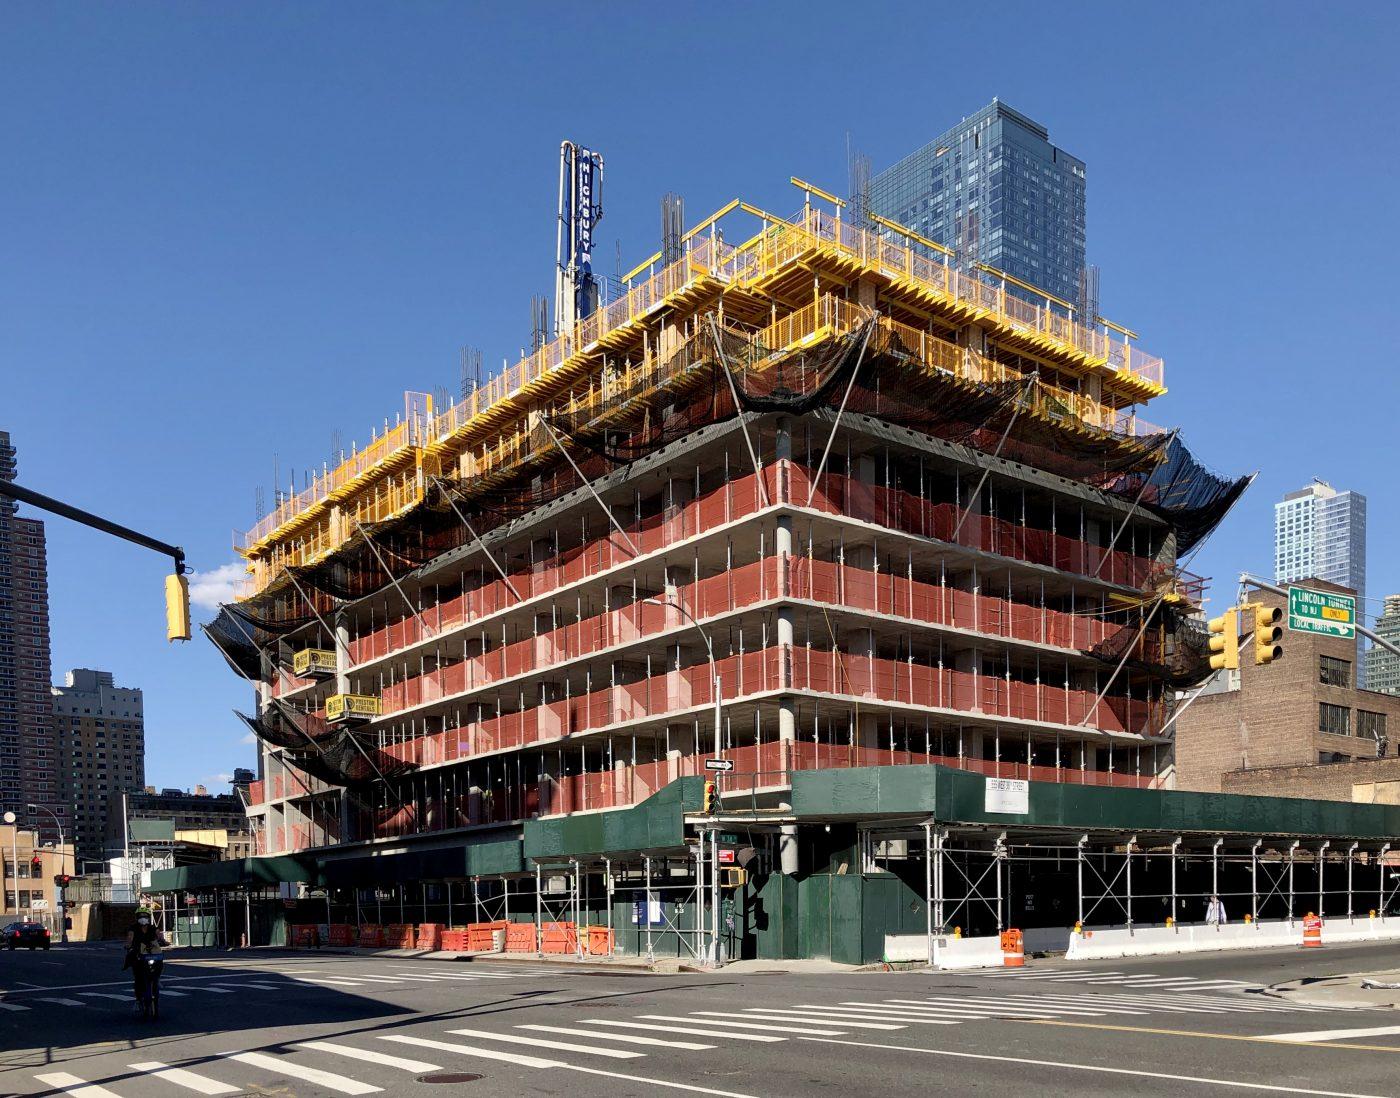 Pelli Clarke Pelli's 555 West 38th Street Continues to ...